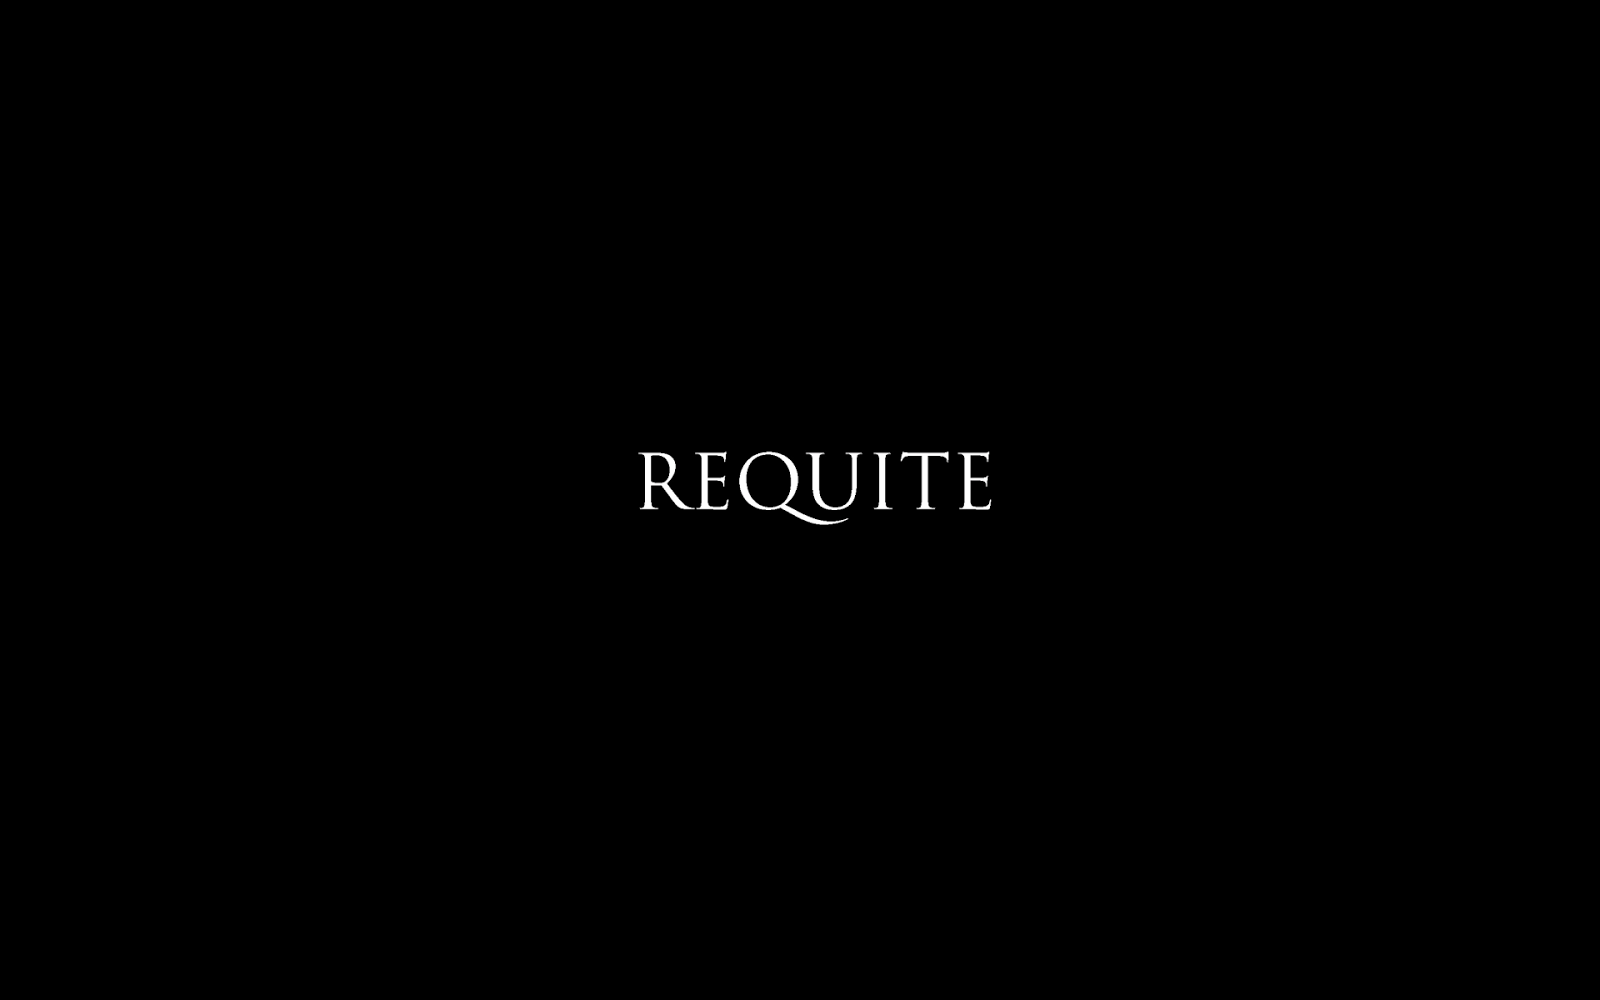 Inspiration - 5-7 Minute Film - A Single Man Phone Call